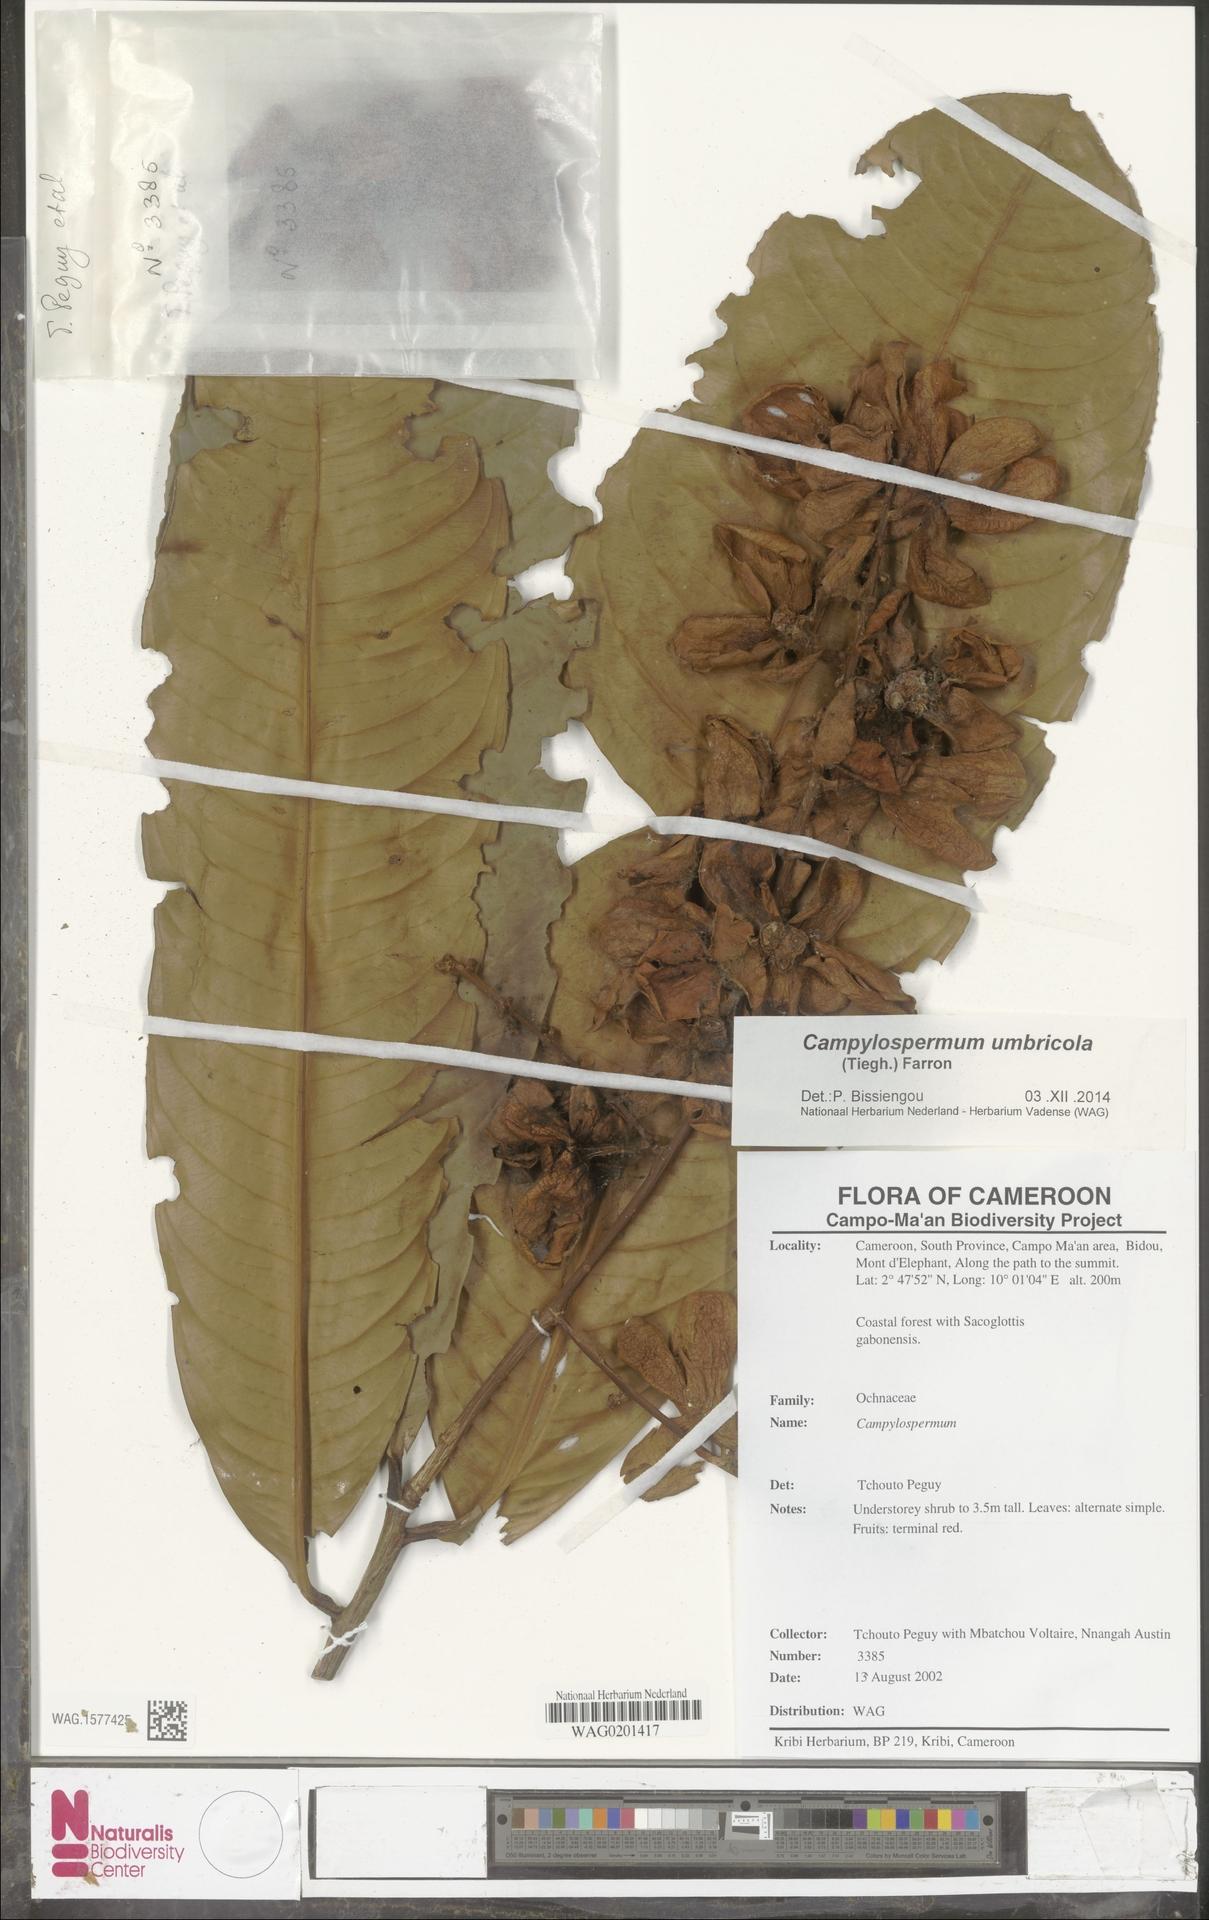 WAG.1577425 | Campylospermum umbricola (Tiegh.) Farron